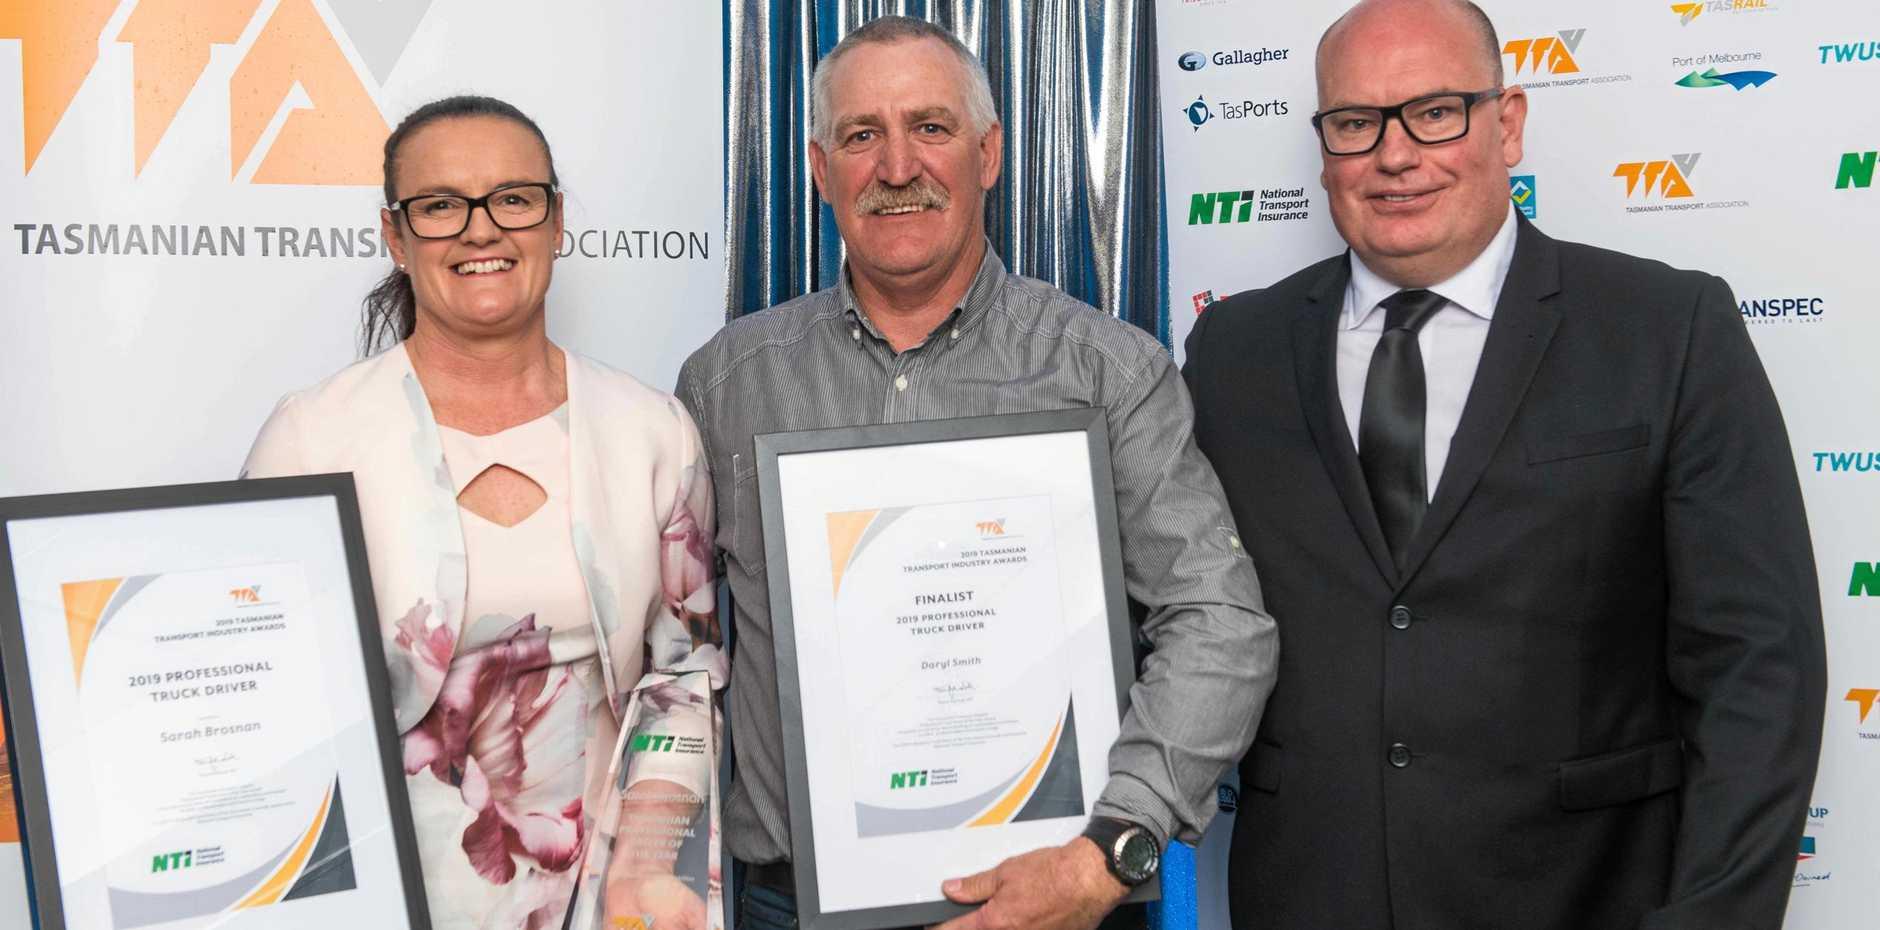 AWARD WINNERS: Sarah Brosnan (2019 Professional Driver), Daryl Smith (2019 Professional Driver Finalist) and Shane Fairhall (NTI).